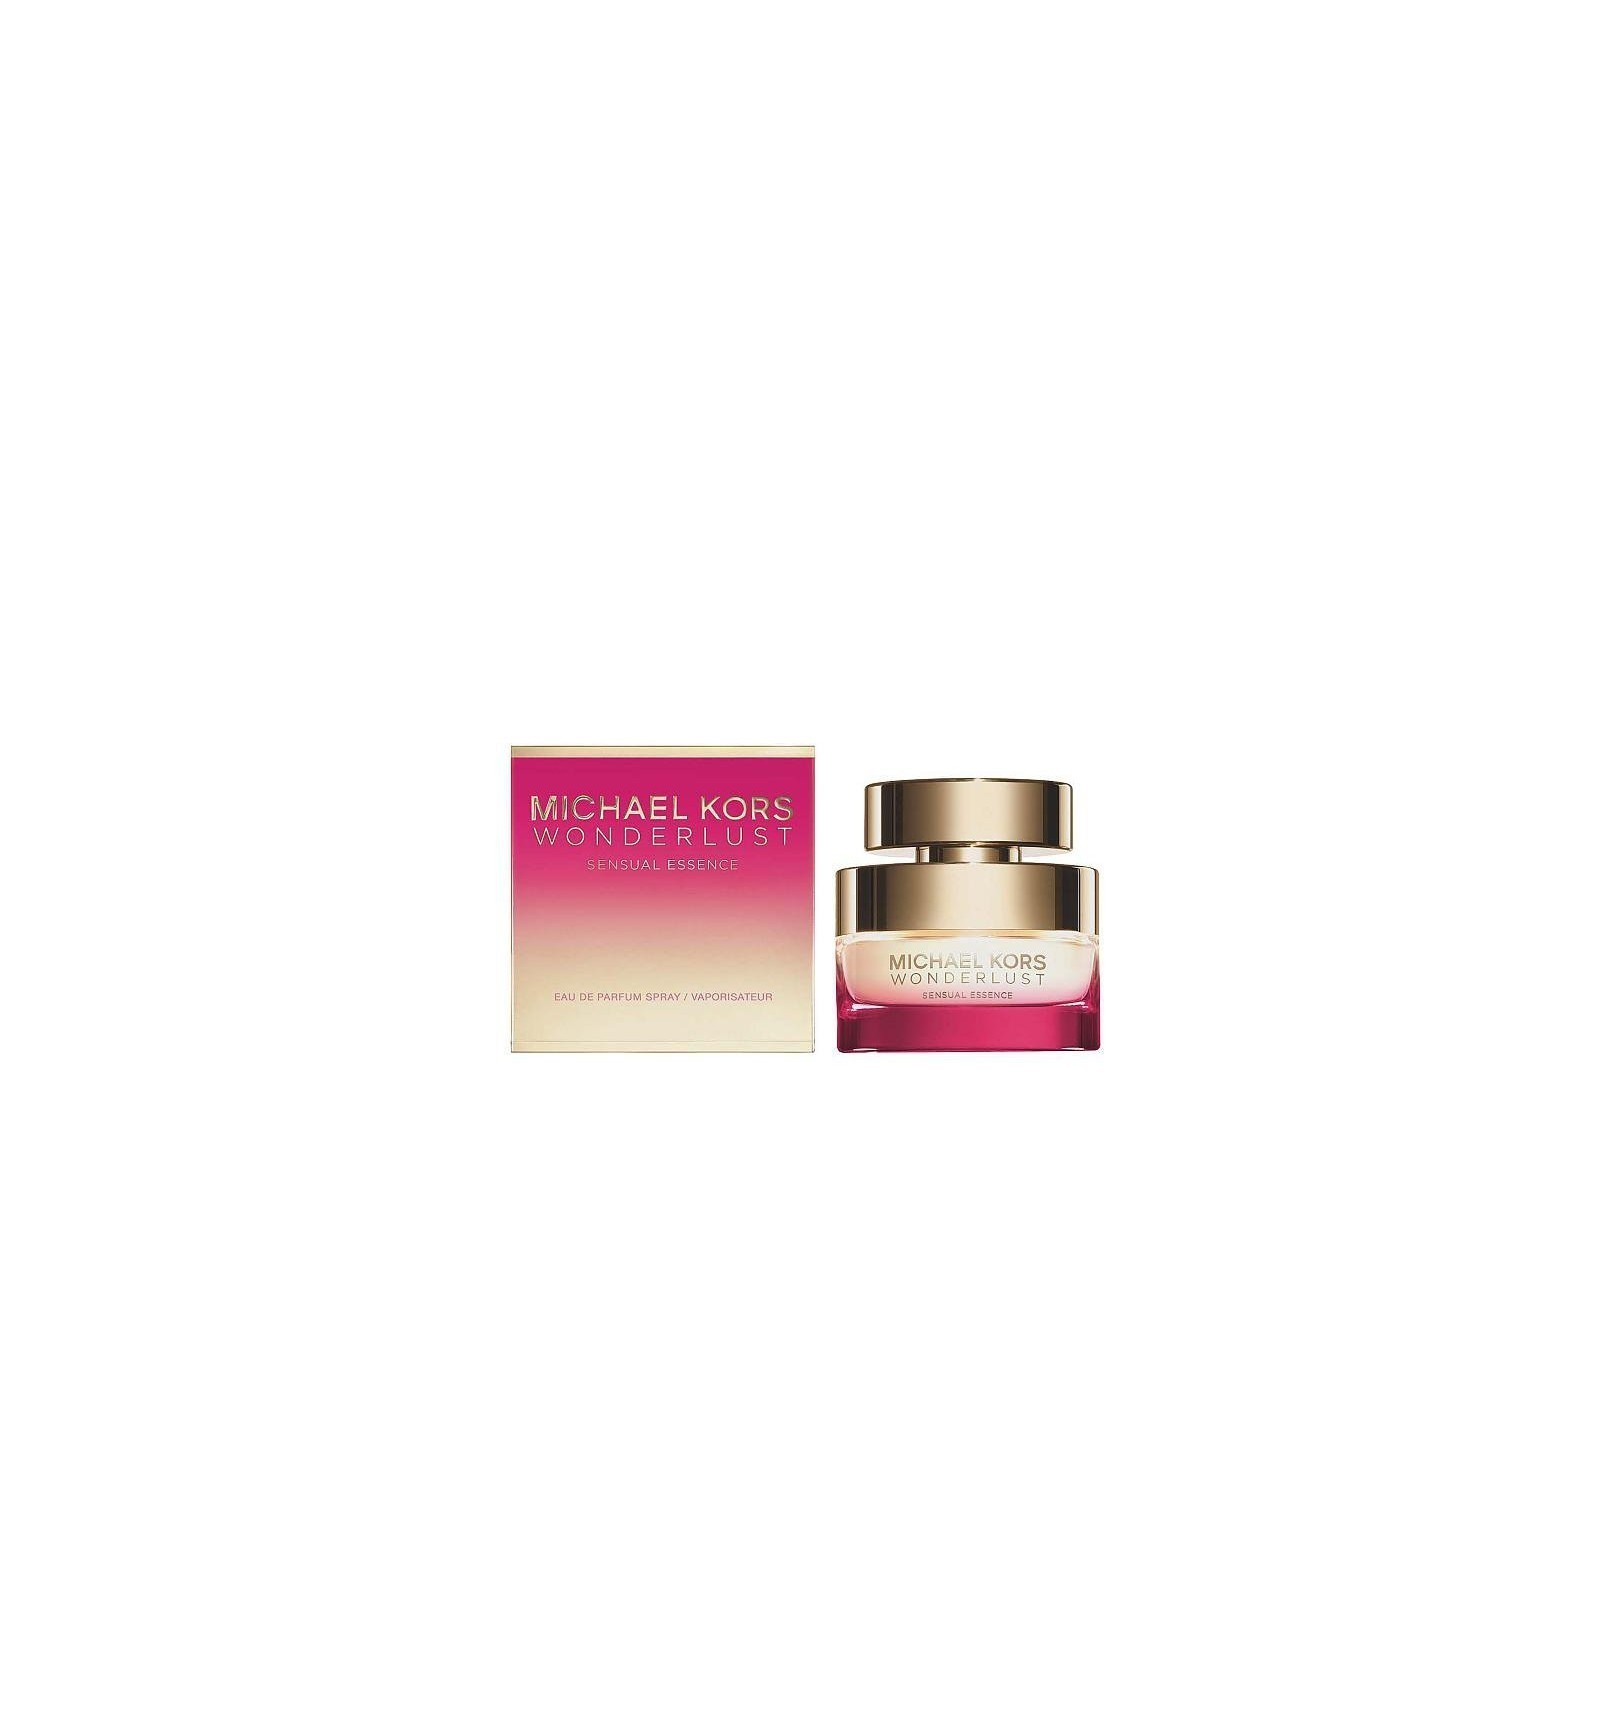 ce555eebb4cbf Michael Kors Wonderlust Sensual Essence Eau de Parfum 30 ml à venda ...